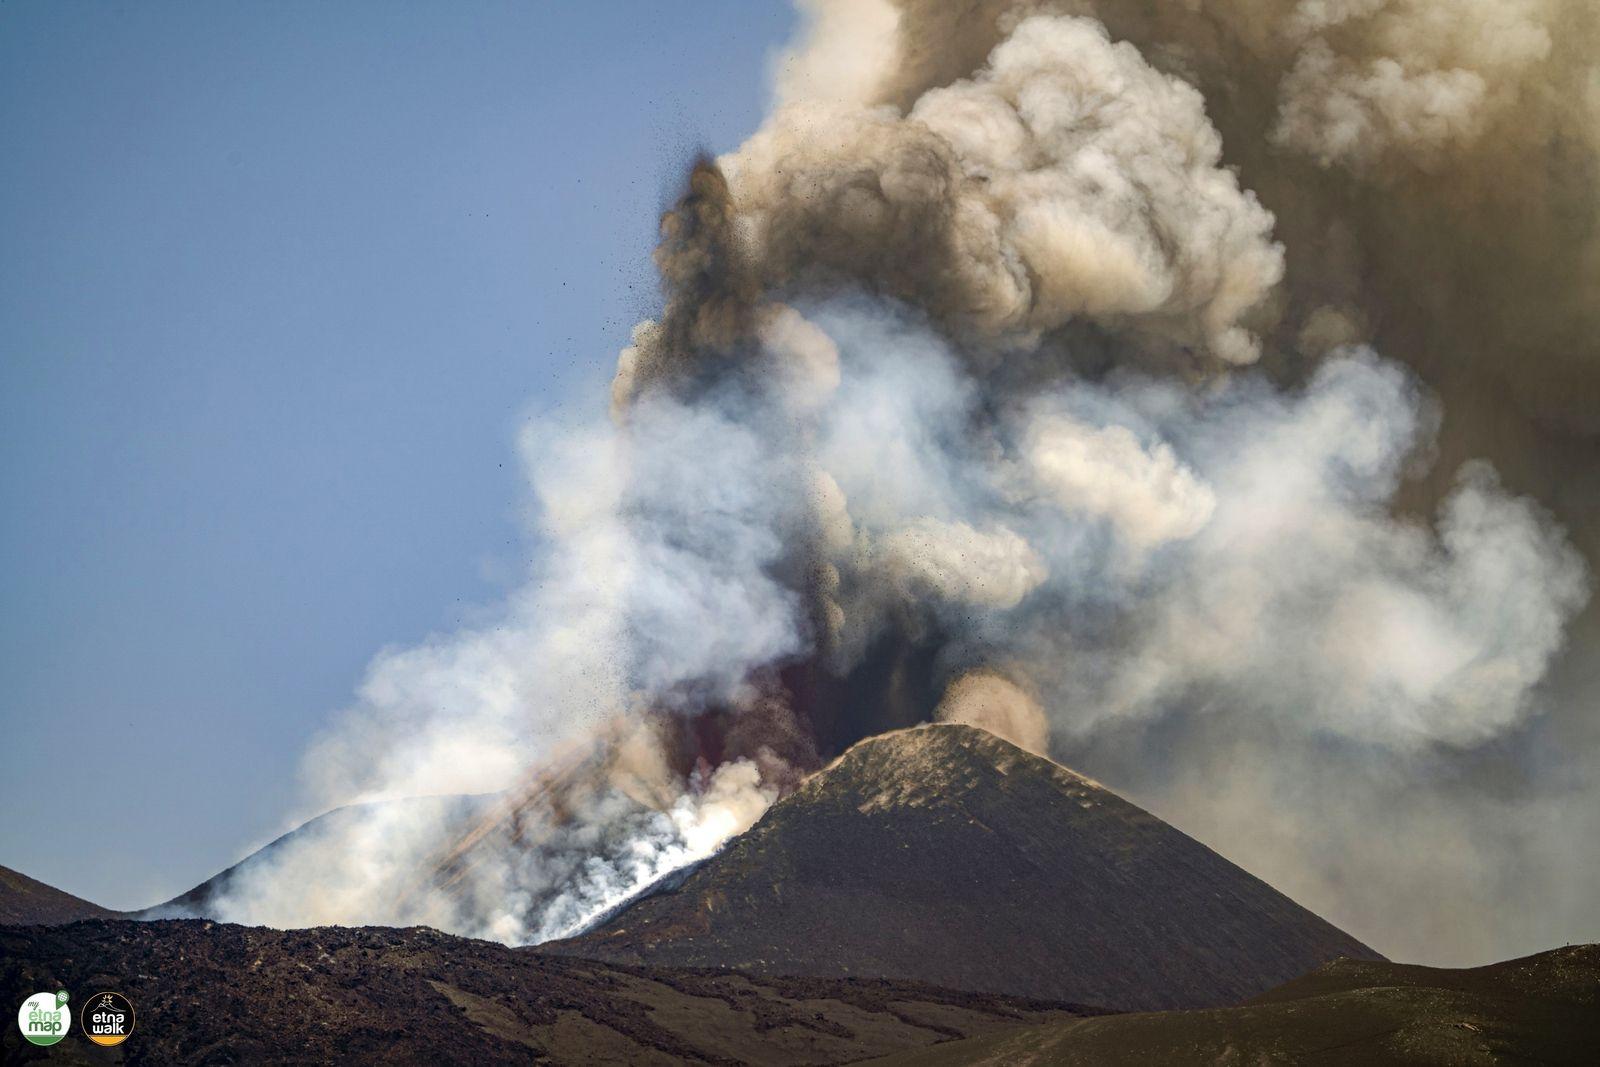 16 Juillet 2021. FR . Italie / Sicile : Etna , Italie : Stromboli , Kamchatka : Karymsky , Nouvelle Zélande : White Island , Indonésie : Sinabung .